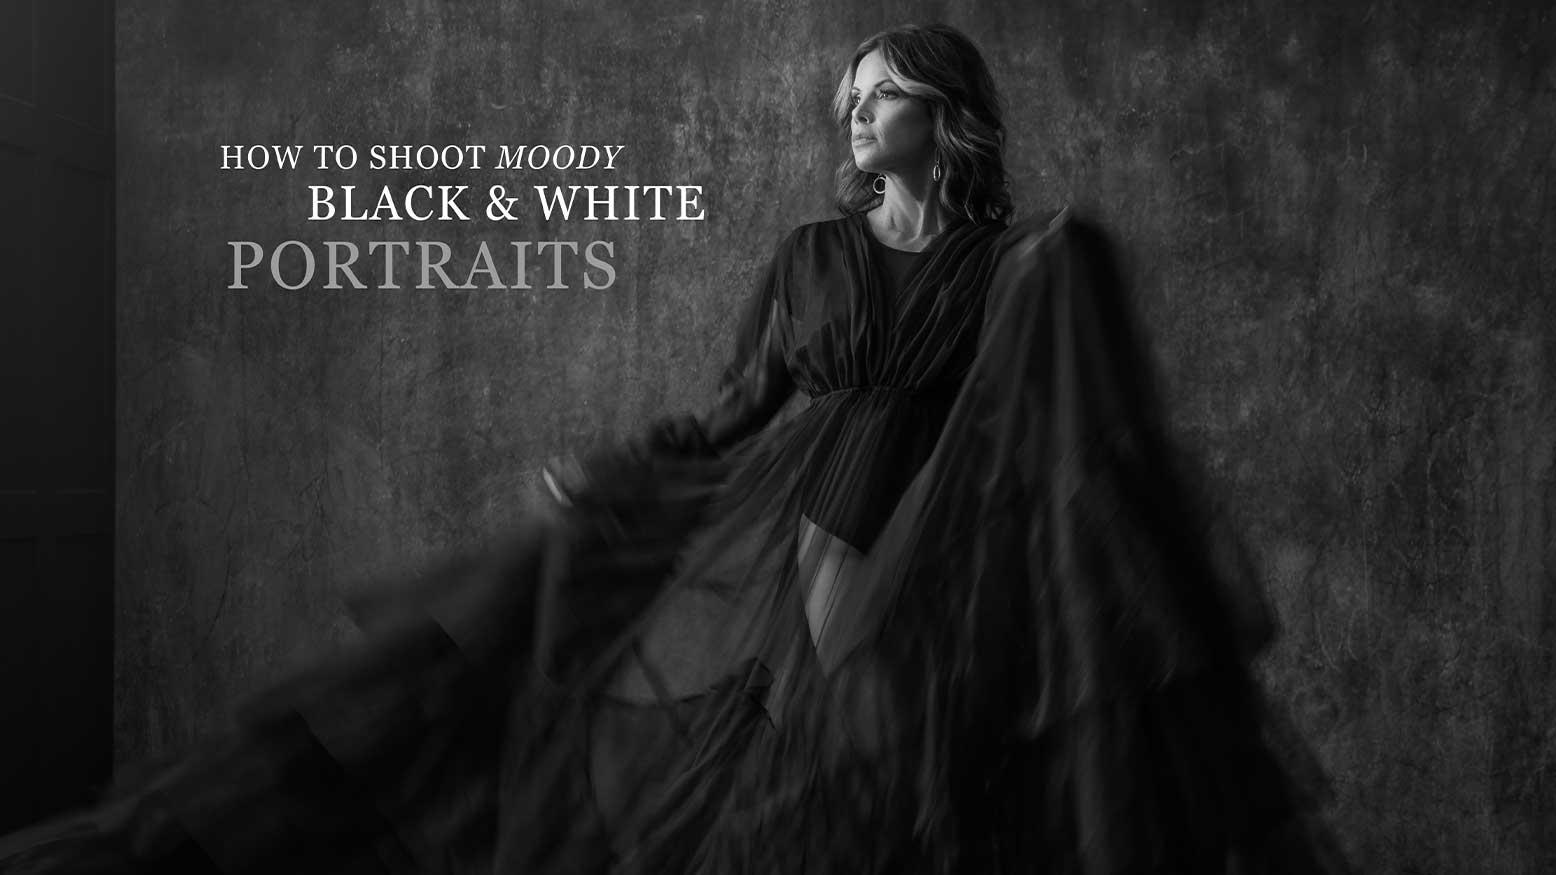 Moody Black & White Portraits